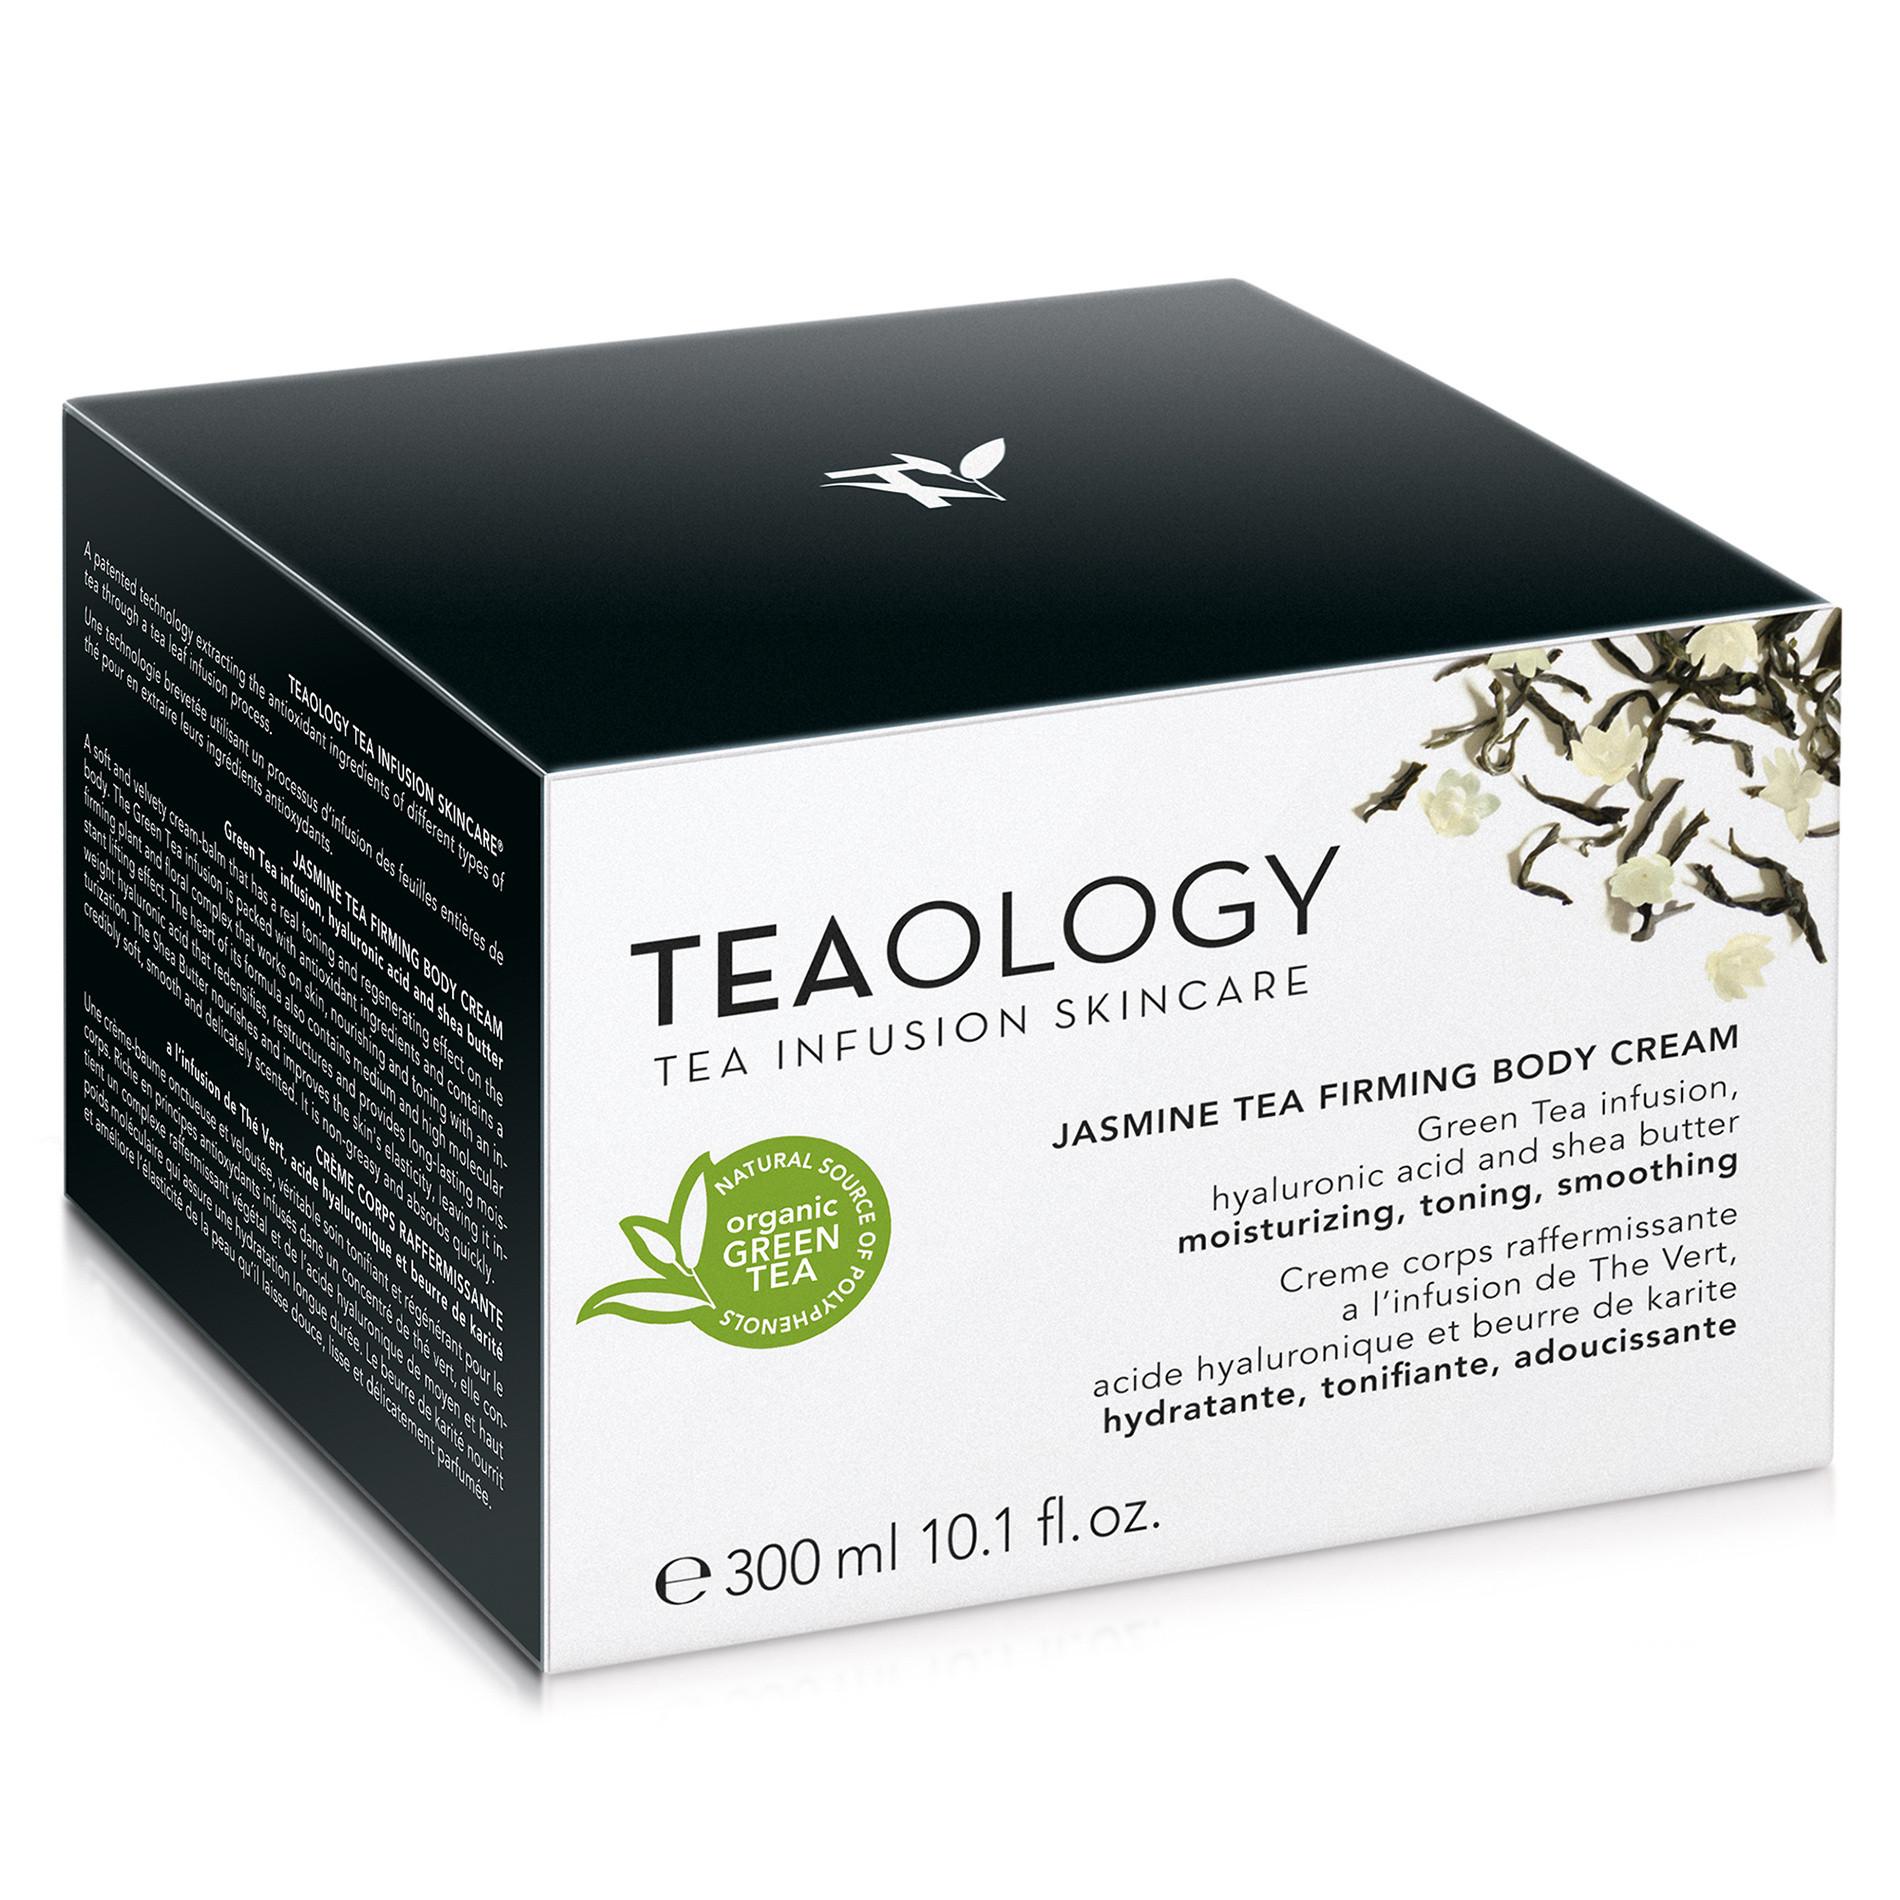 Jasmine Tea Body Cream Rassodante 300 ml, Bianco, large image number 0